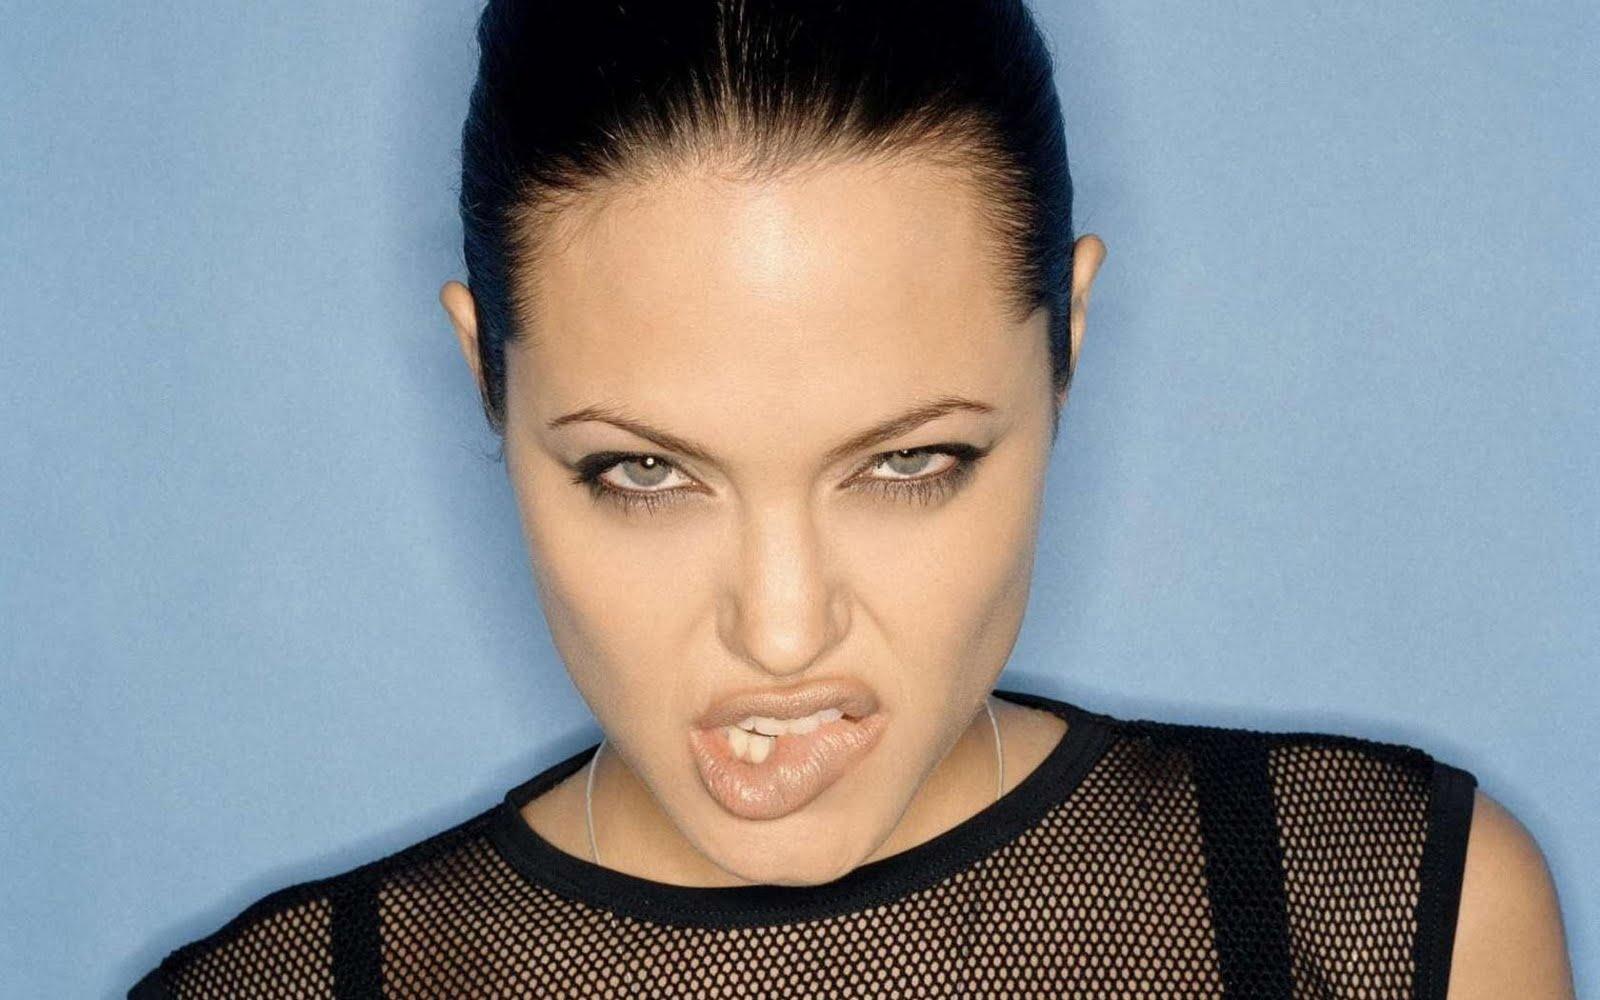 http://2.bp.blogspot.com/-jpAMSBupFKo/TbW4fmj4RMI/AAAAAAAANy4/5GvOigotYkg/s1600/Angelina_Jolie_sexy_wallpaper%2B%25281%2529.jpg